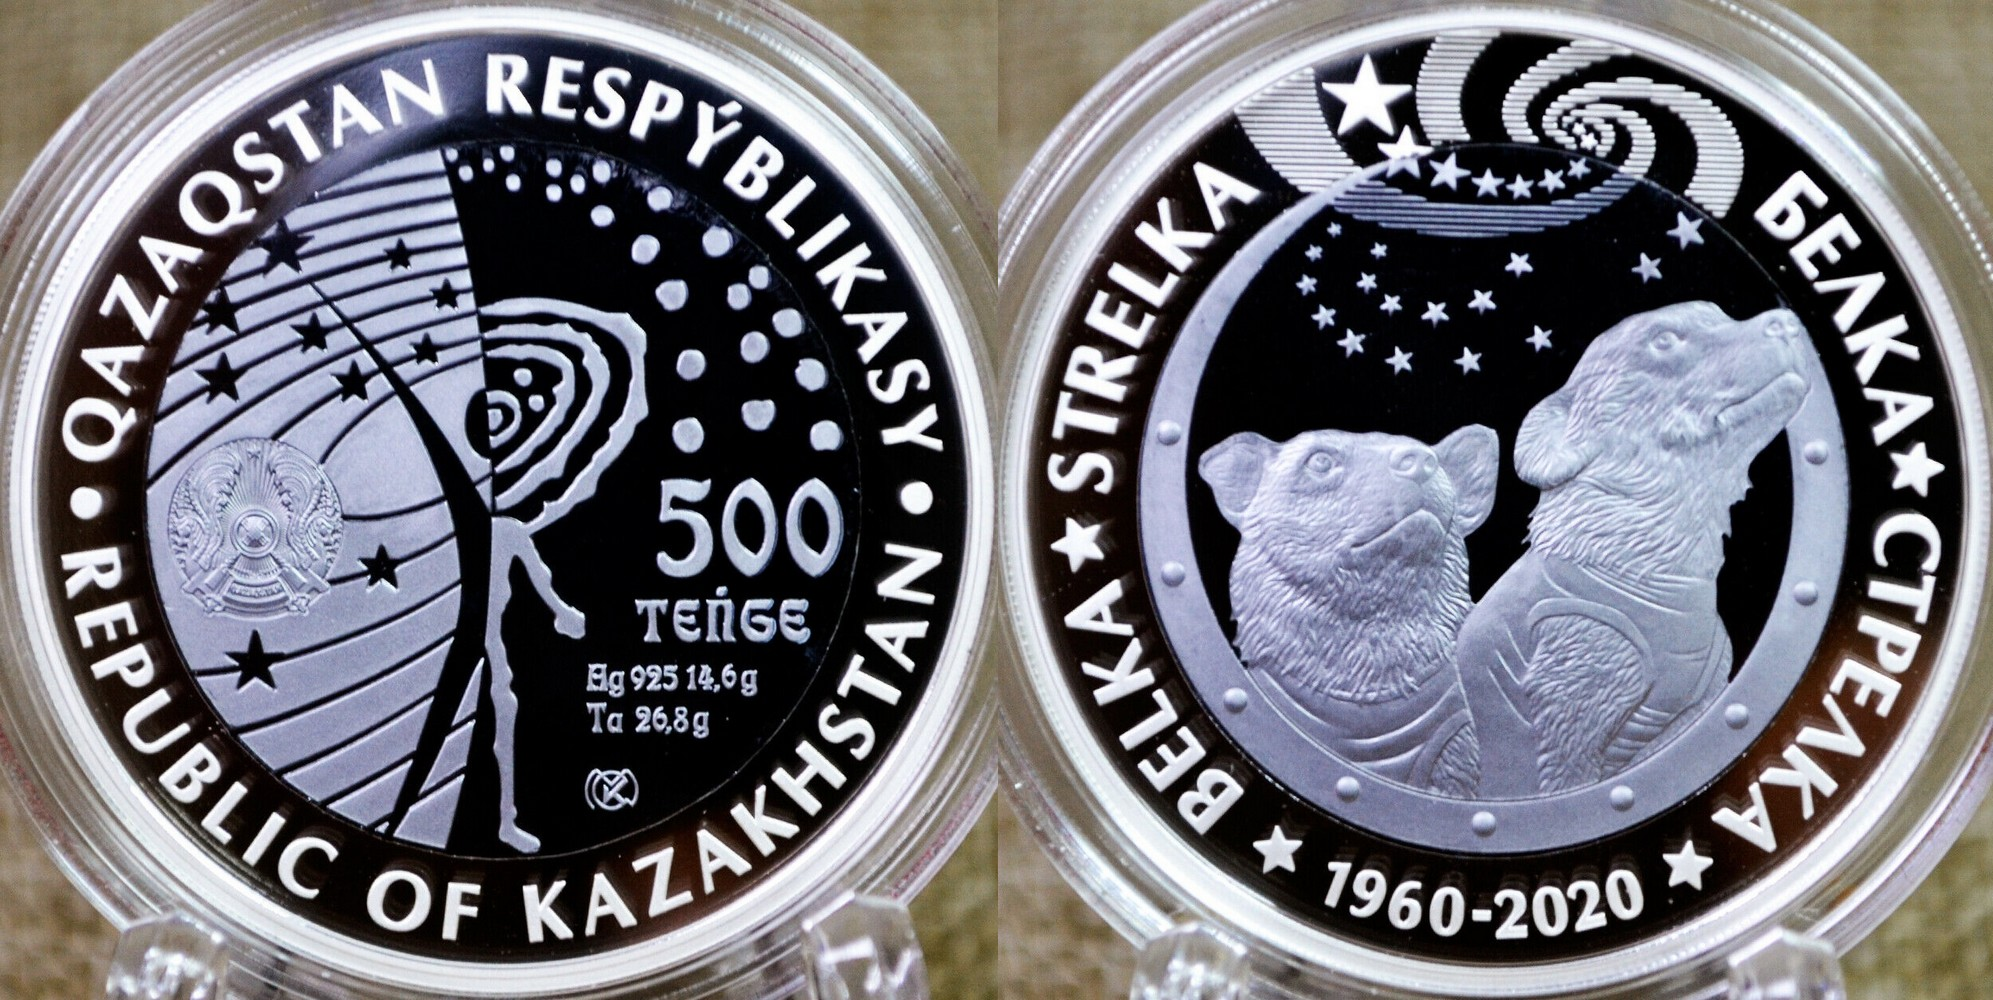 kazakhsran-2020-belka-et-strelka-chiens-dans-lespace